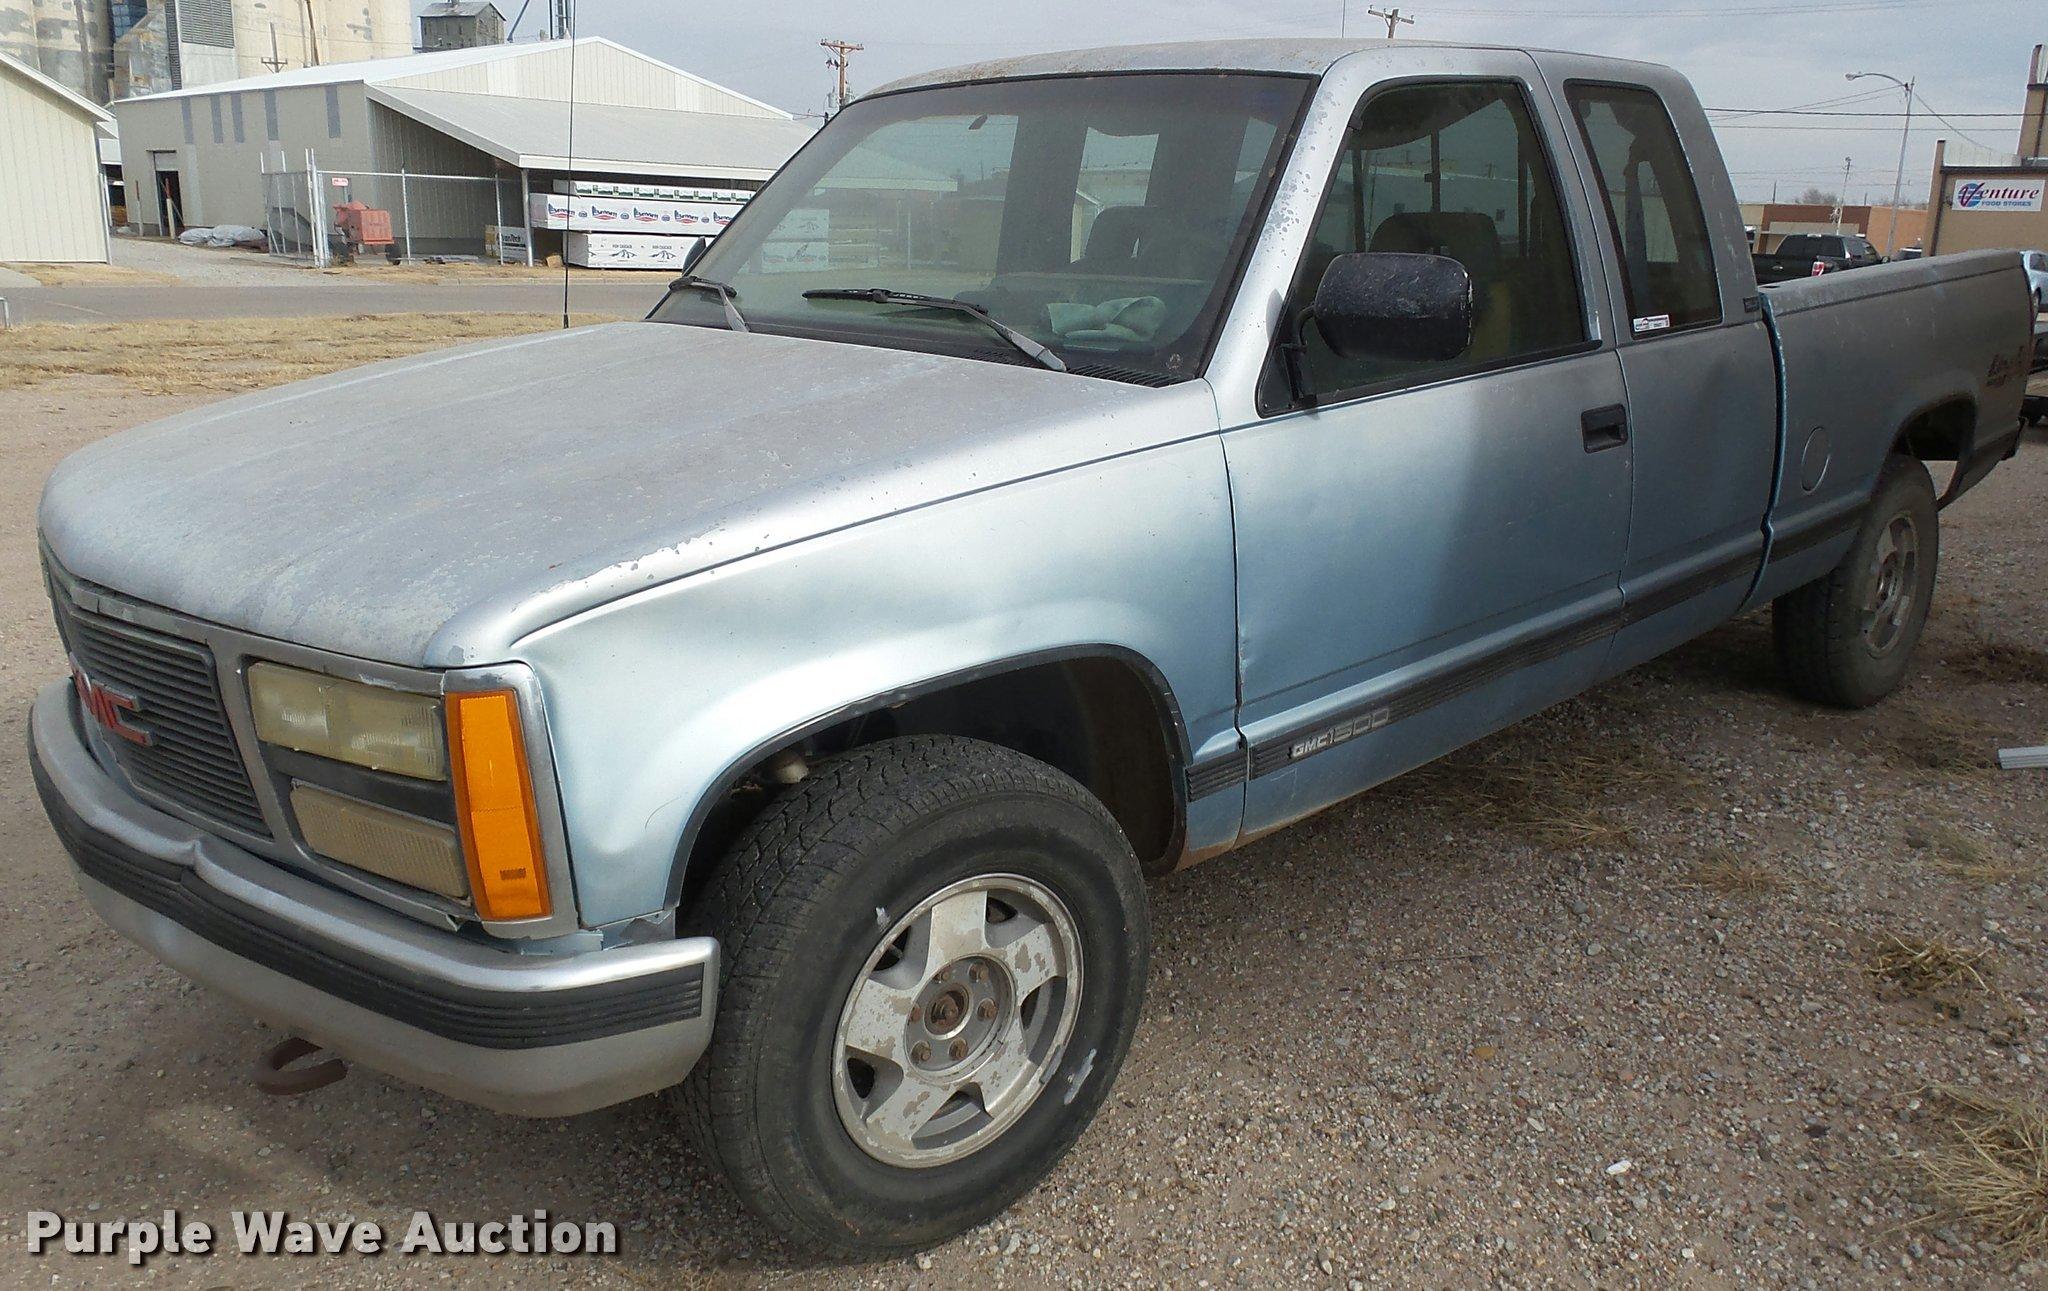 1992 gmc sierra 1500 ext cab pickup truck in sublette ks item di9557 sold purple wave 1992 gmc sierra 1500 ext cab pickup